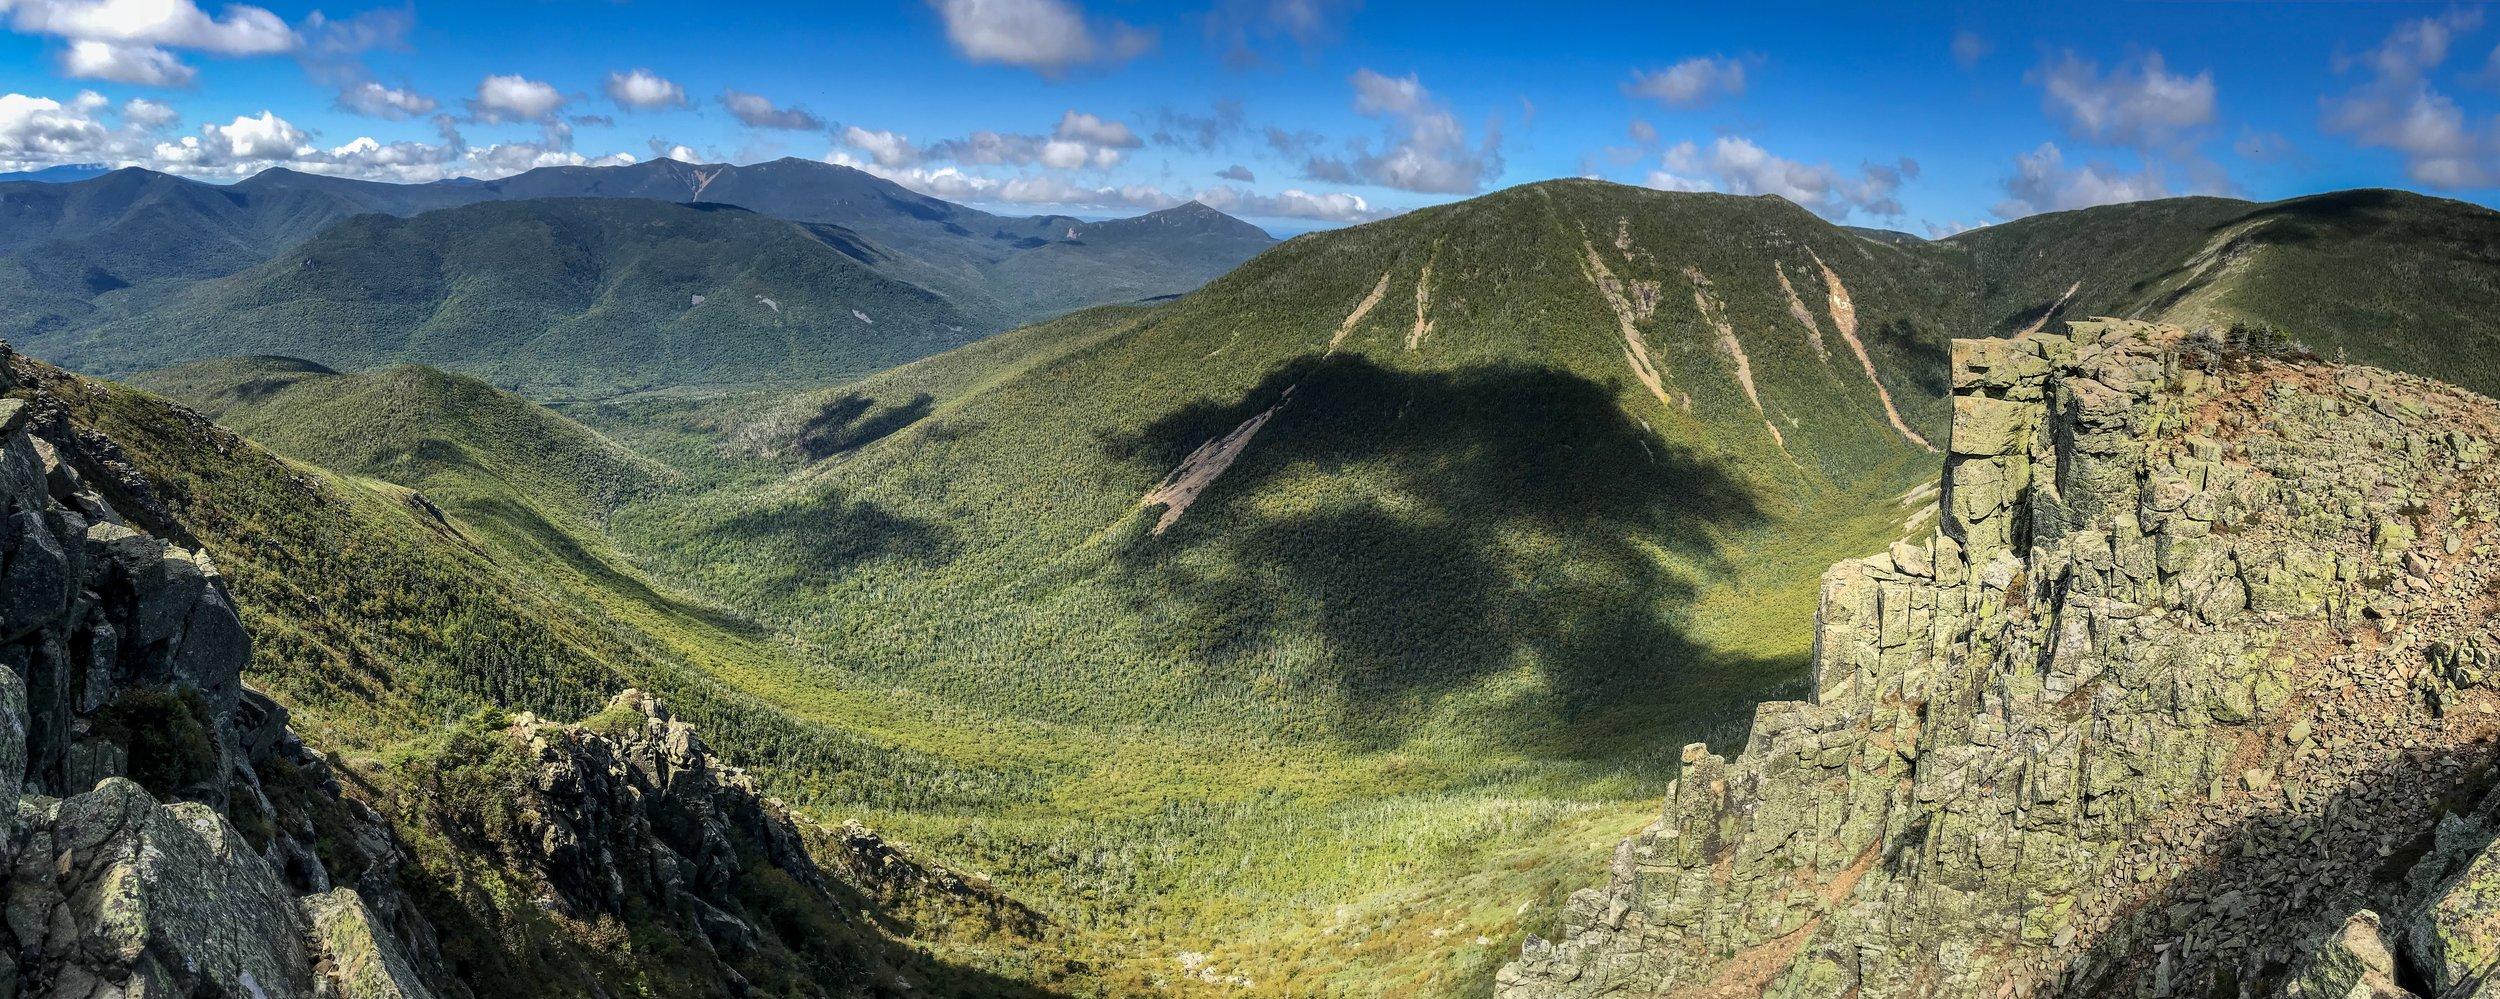 Bond Cliff and the Pemigewasset Wilderness.